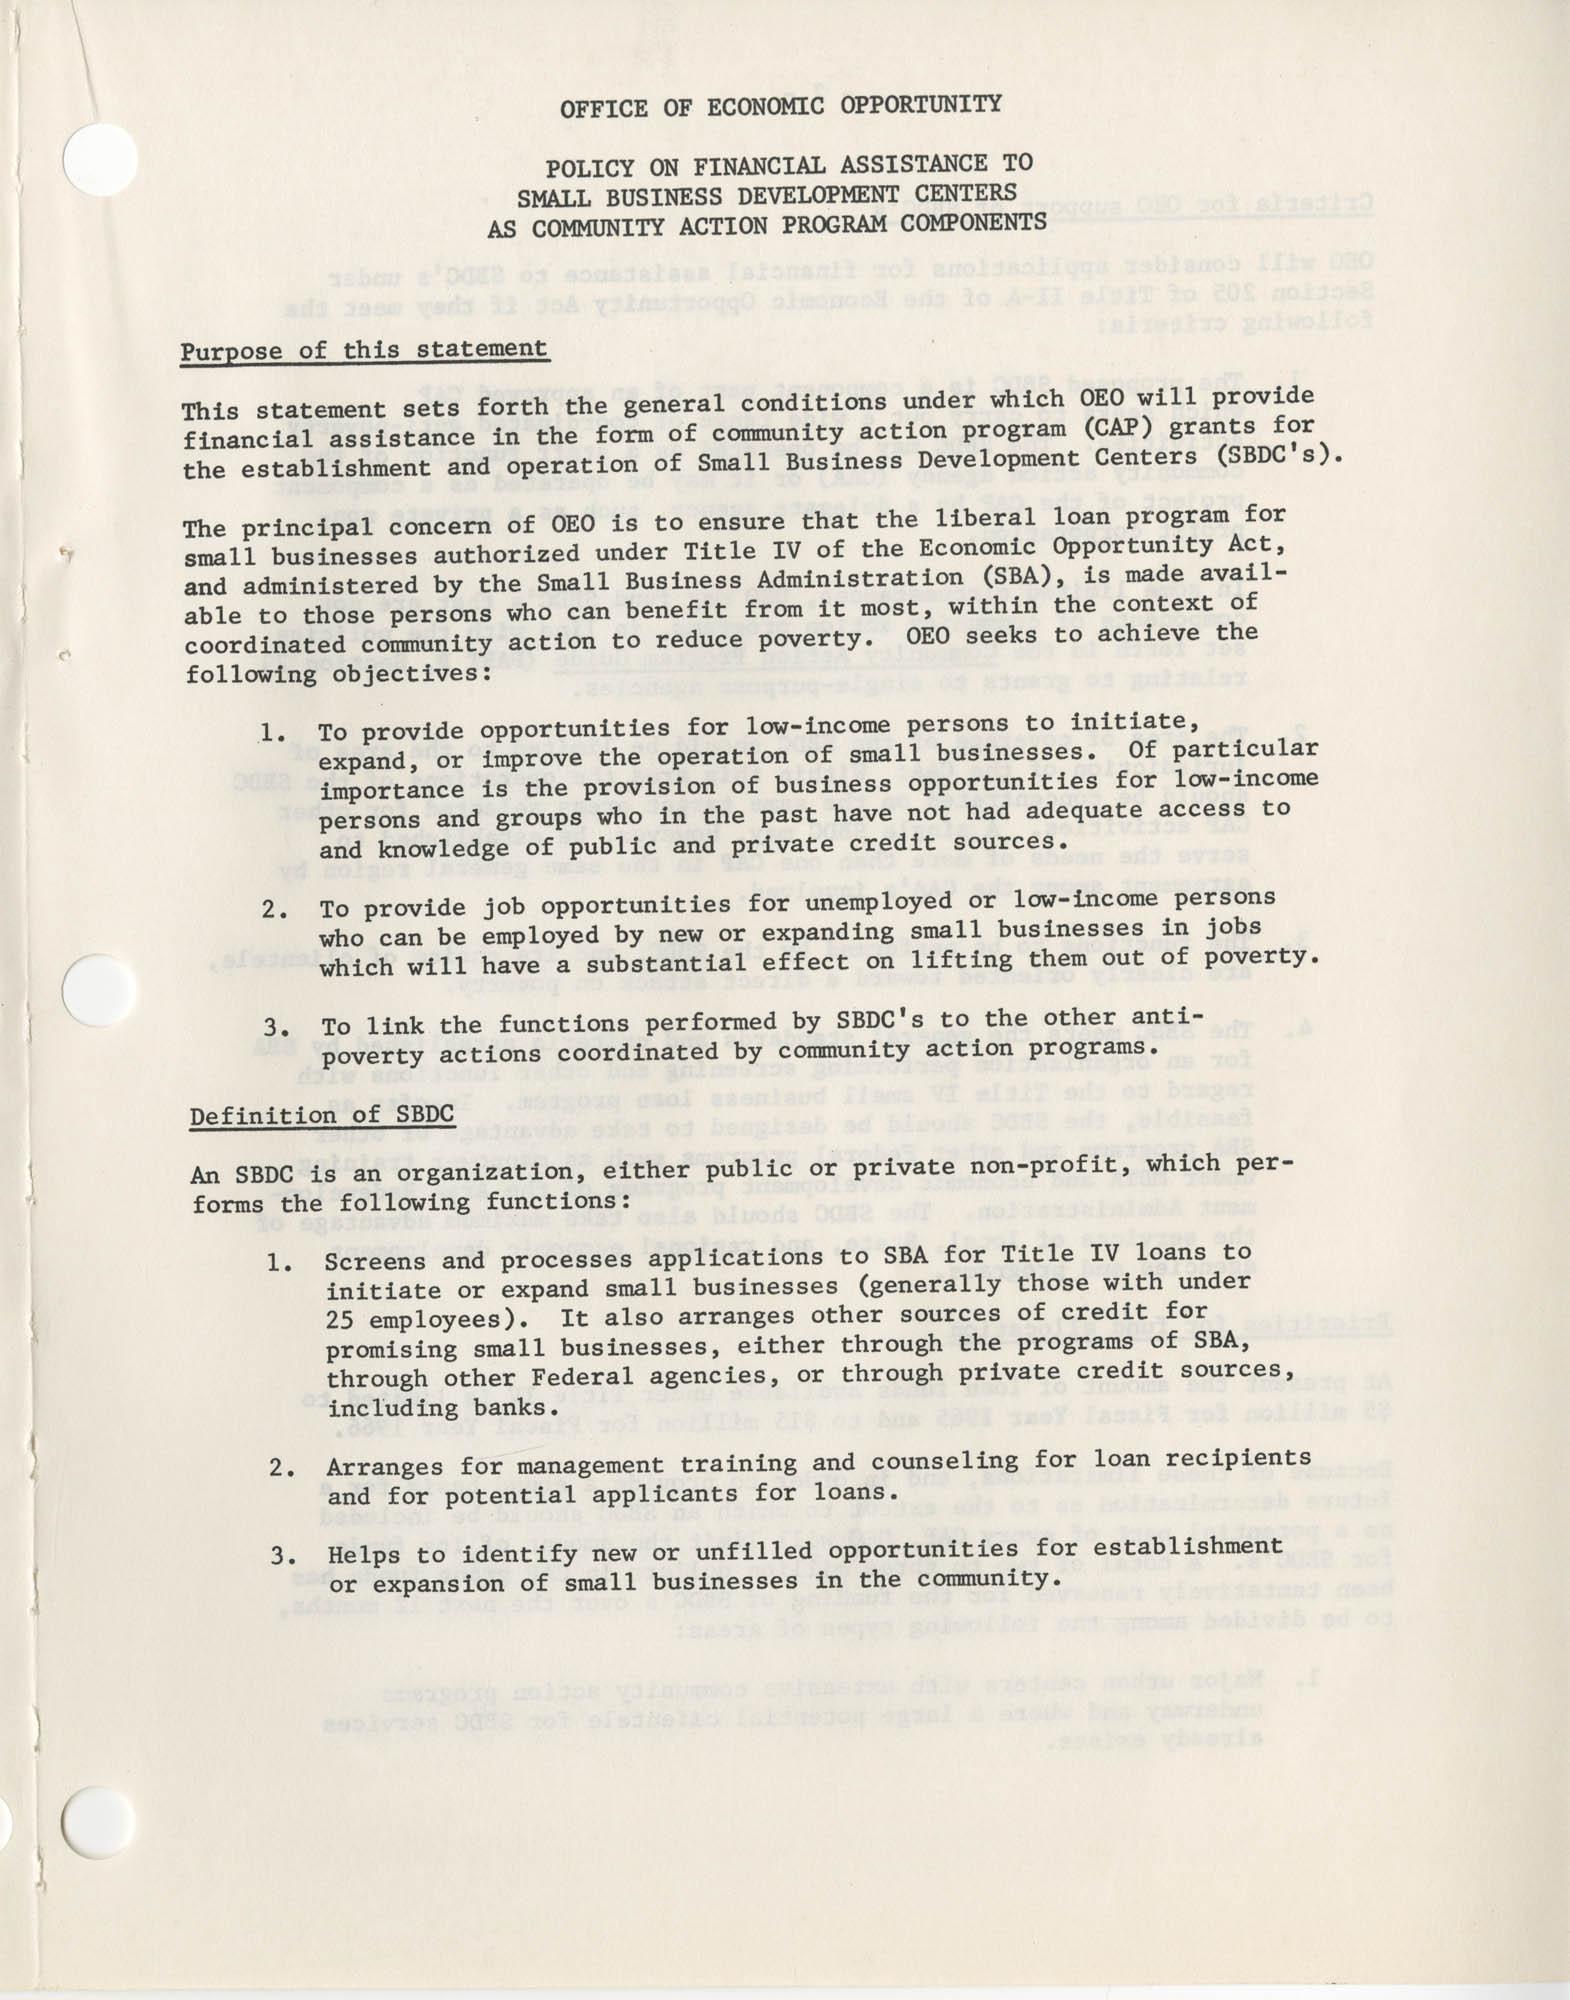 Community Action Program Memorandum No. 5, Attachment Page 1